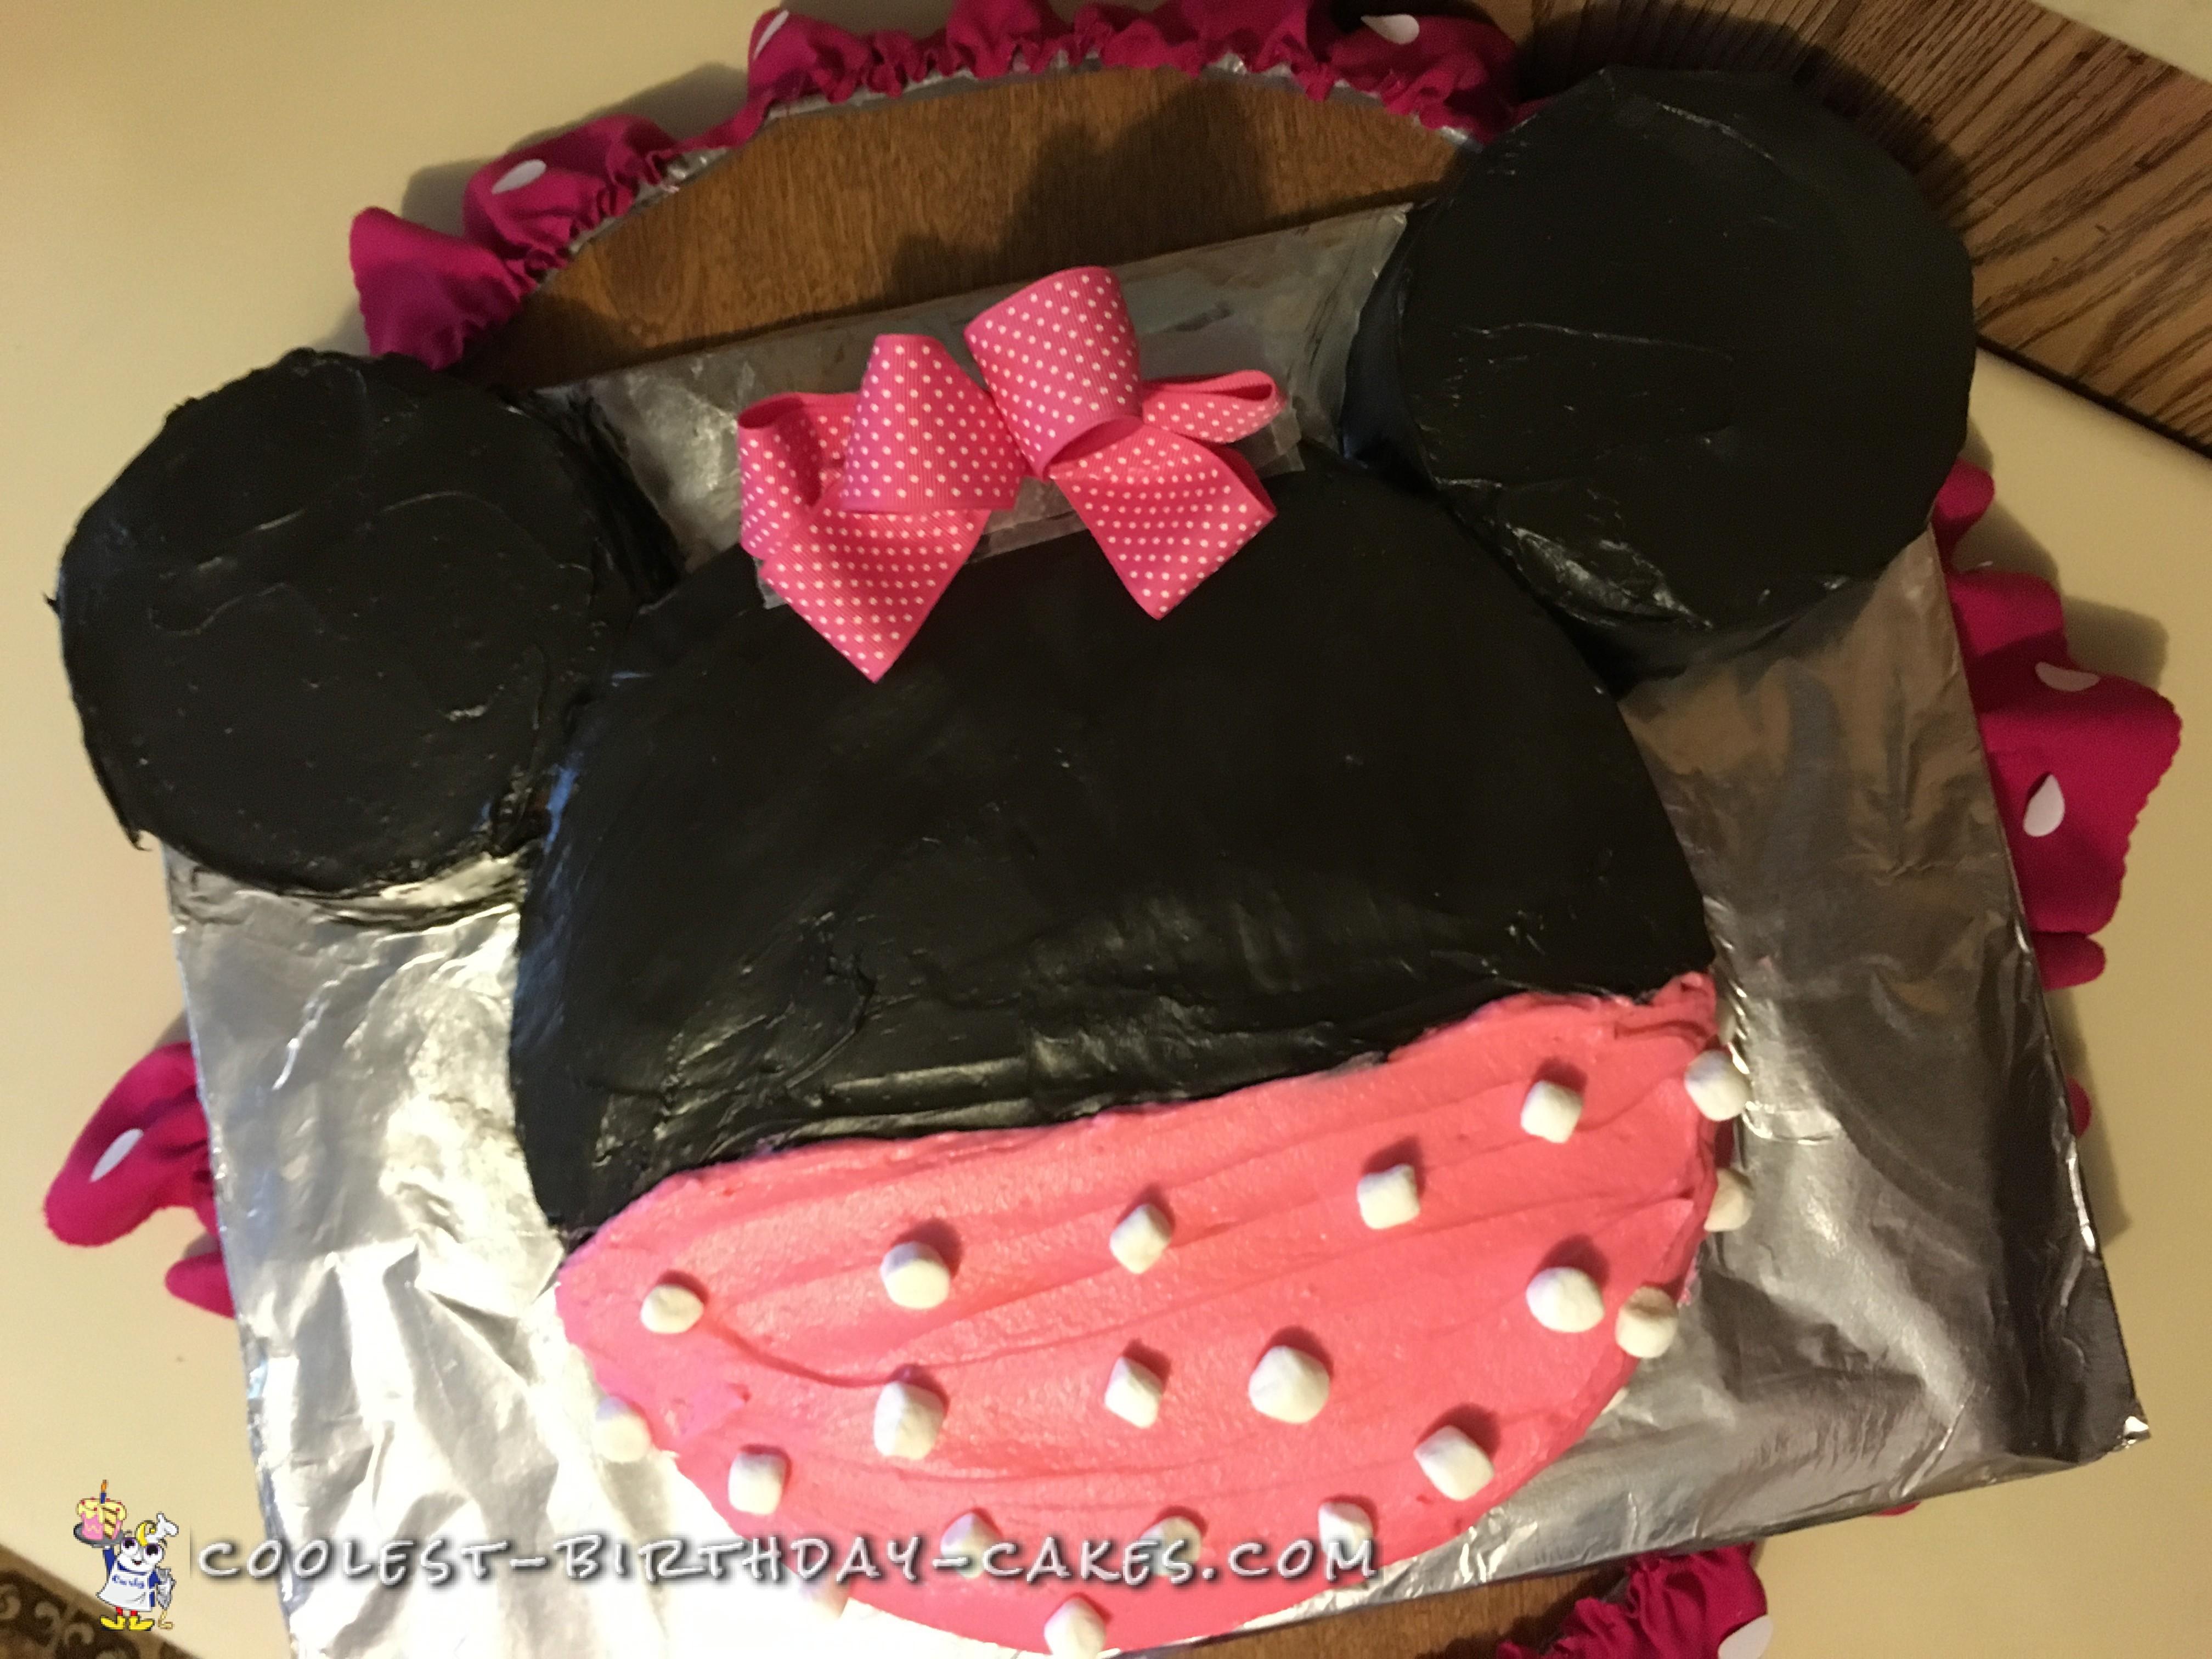 How to Make a Minnie Mouse Cake How to Make a Minnie Mouse Cake new pics